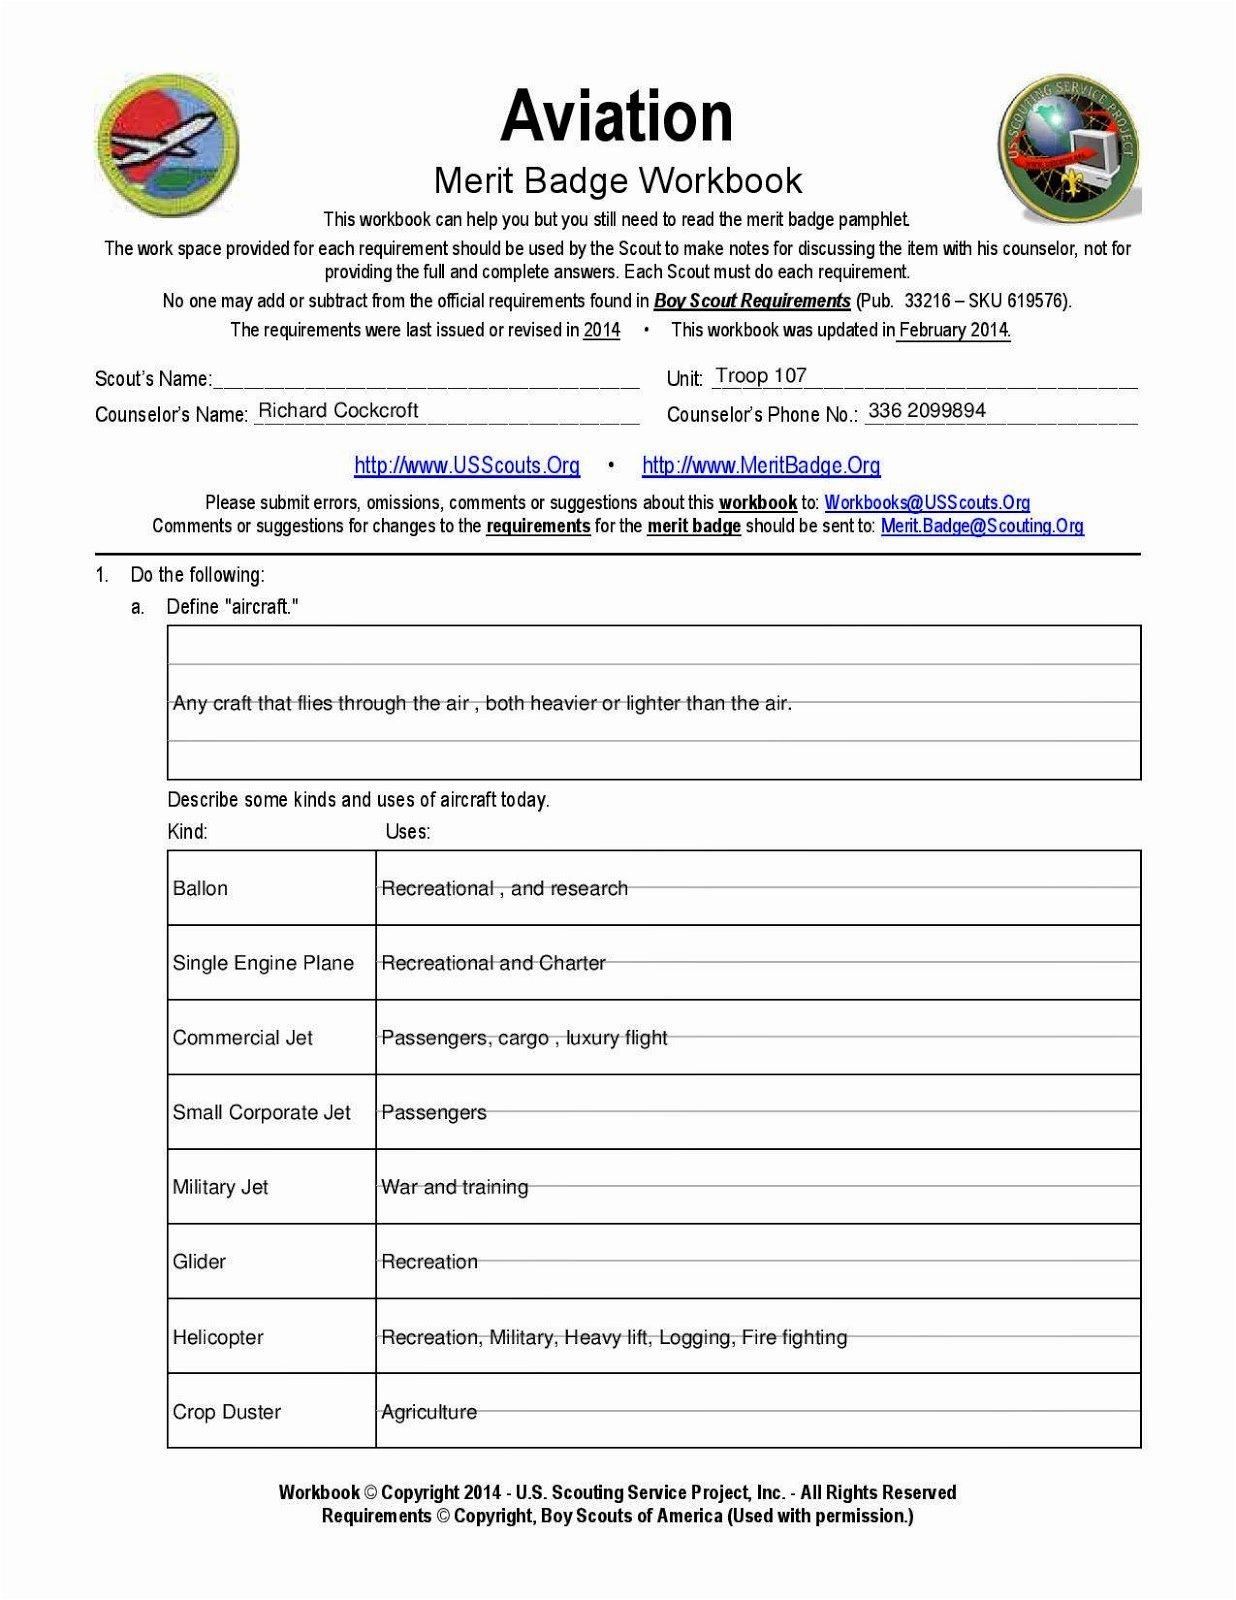 First Aid Merit Badge Worksheet Answers  Yooob Inside Chess Merit Badge Worksheet